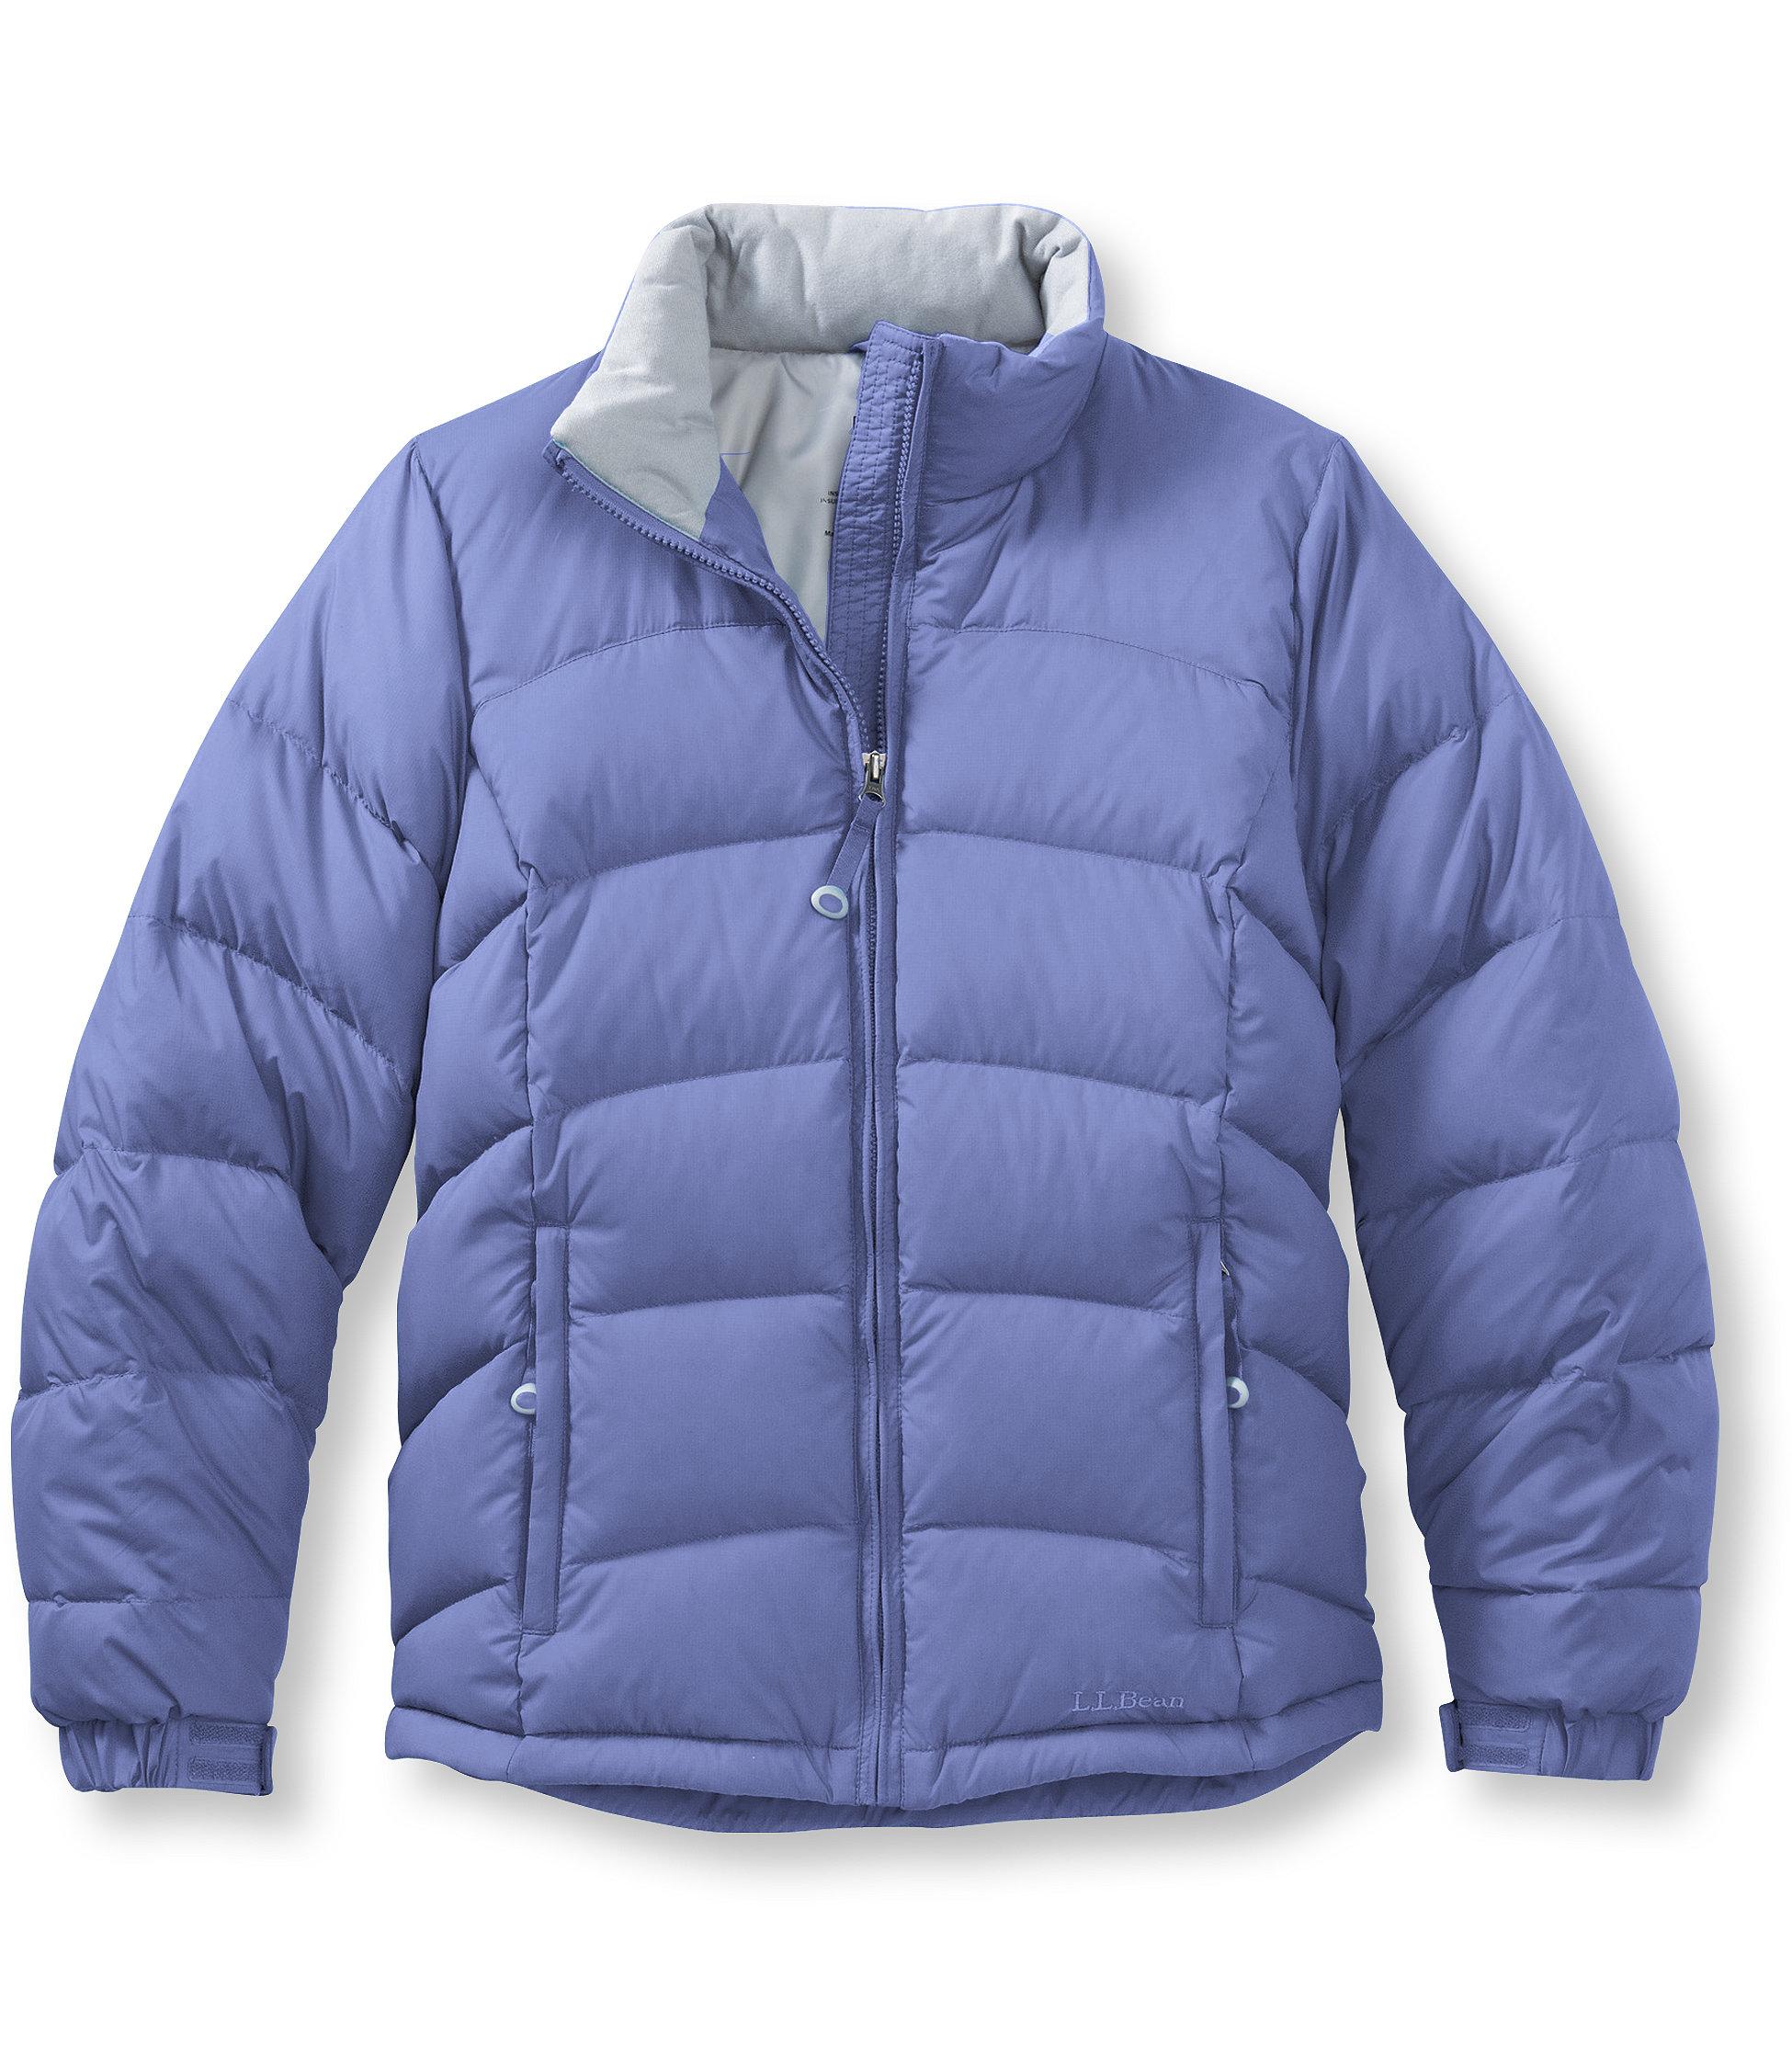 L.L.Bean Goose Down Jacket